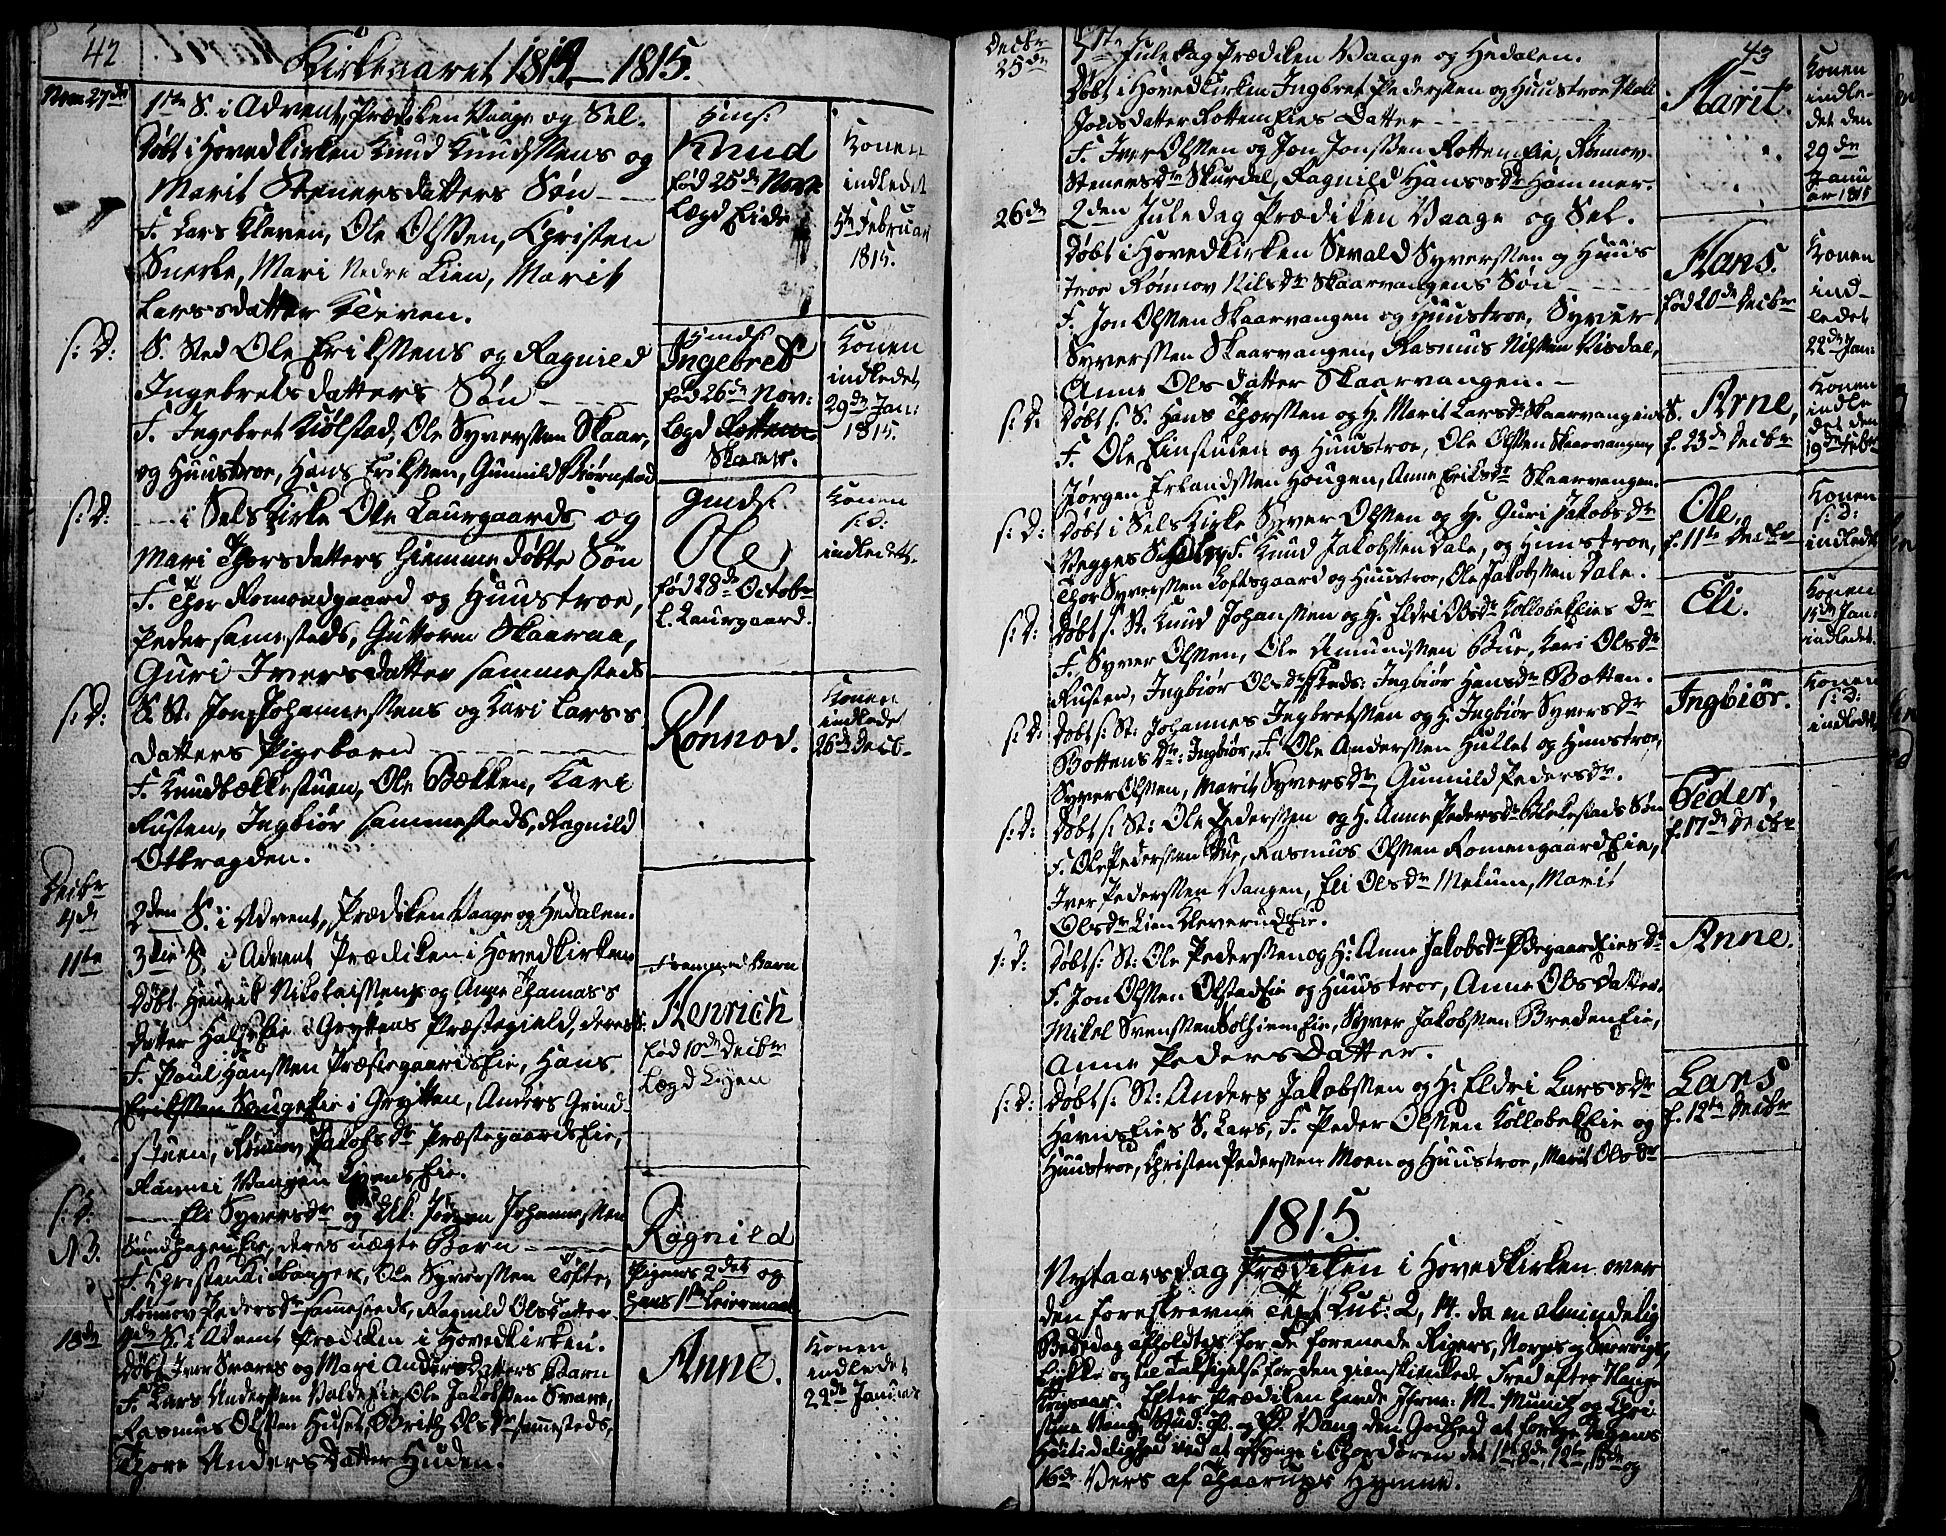 SAH, Vågå prestekontor, Ministerialbok nr. 2, 1810-1815, s. 42-43